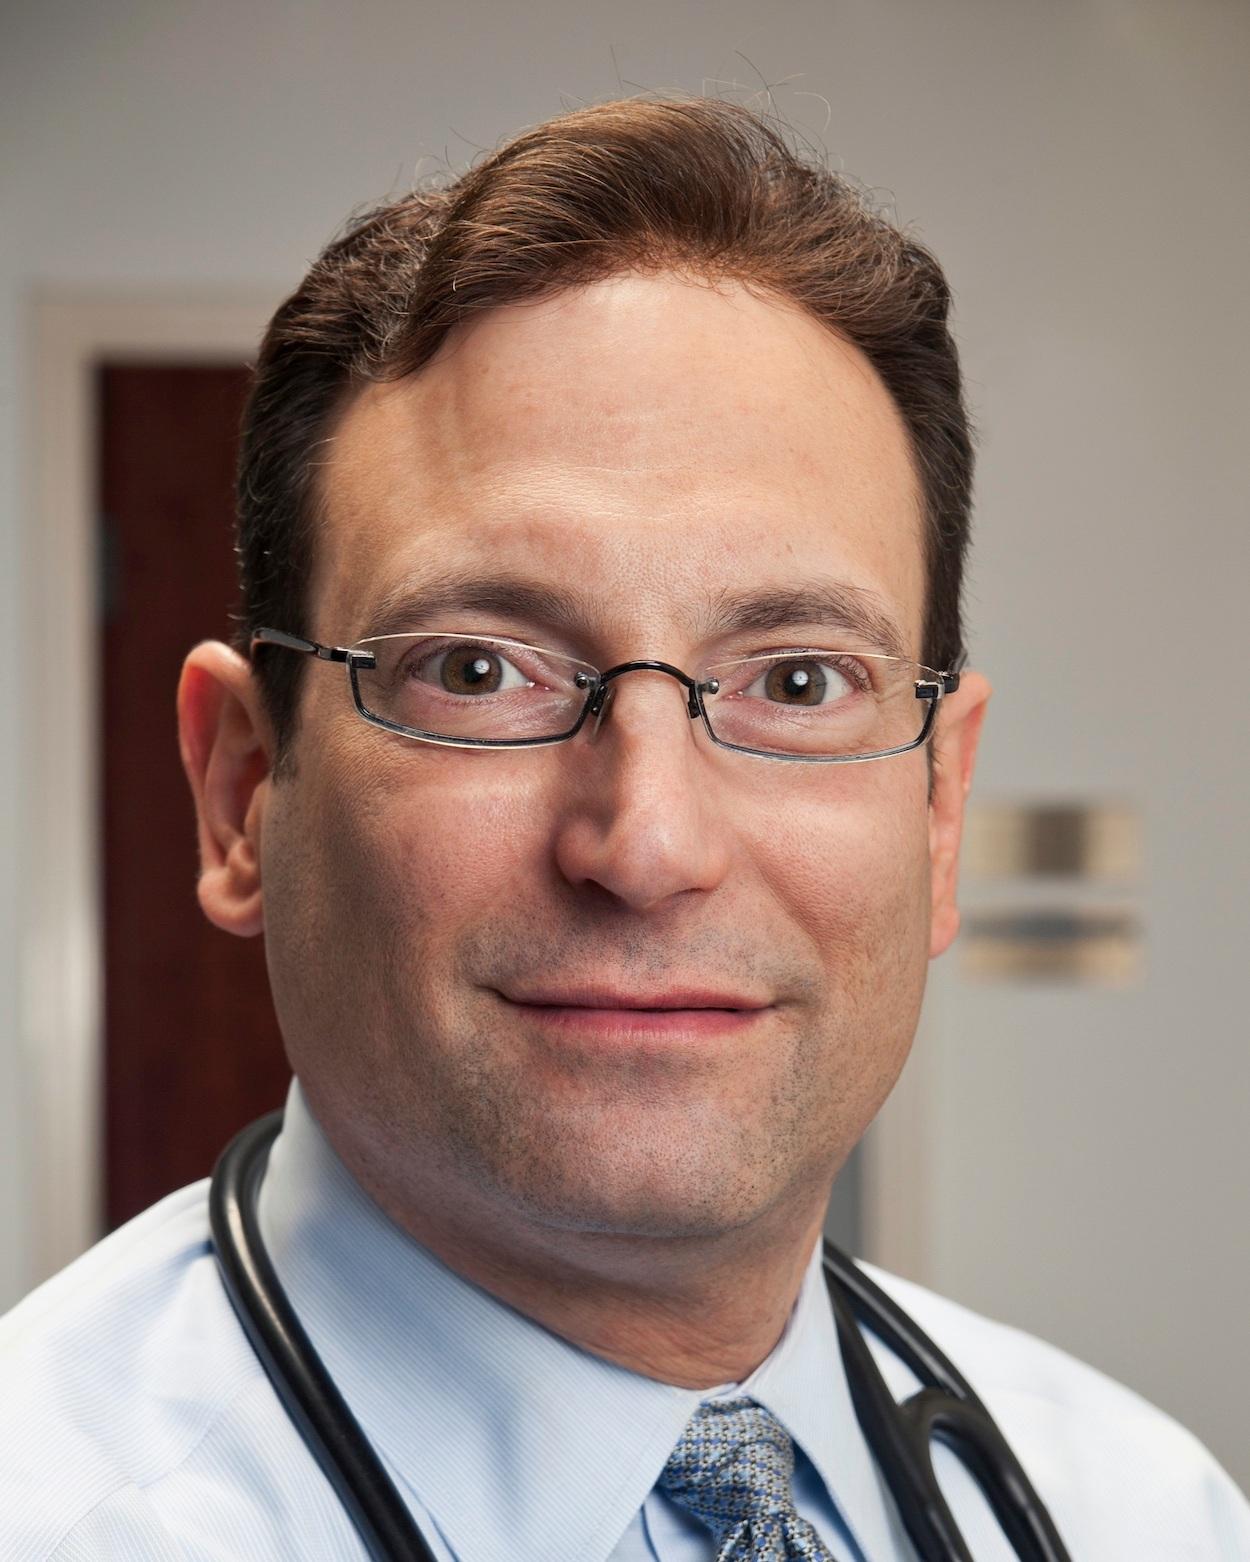 Michael Cirigliano, MDFounder's Associate Professor of General Internal Medicine - Perelman School of Medicine